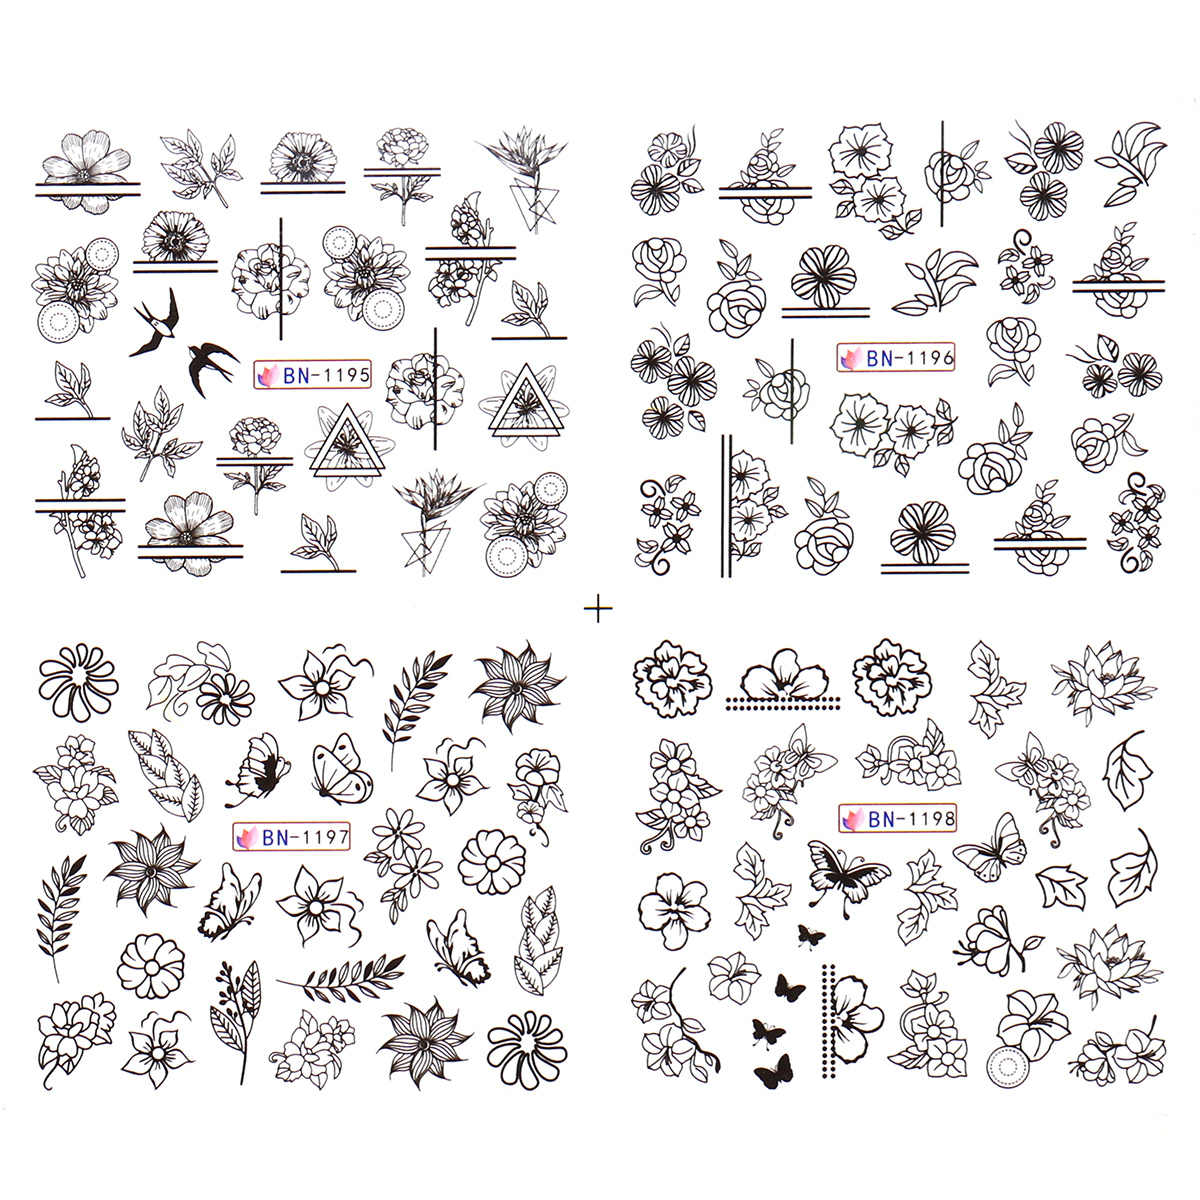 Monja 12Pcs เล็บดอกไม้ผีเสื้อสีดำสติกเกอร์ 3D DIY ลายน้ำเล็บสติ๊กเกอร์เล็บตกแต่ง